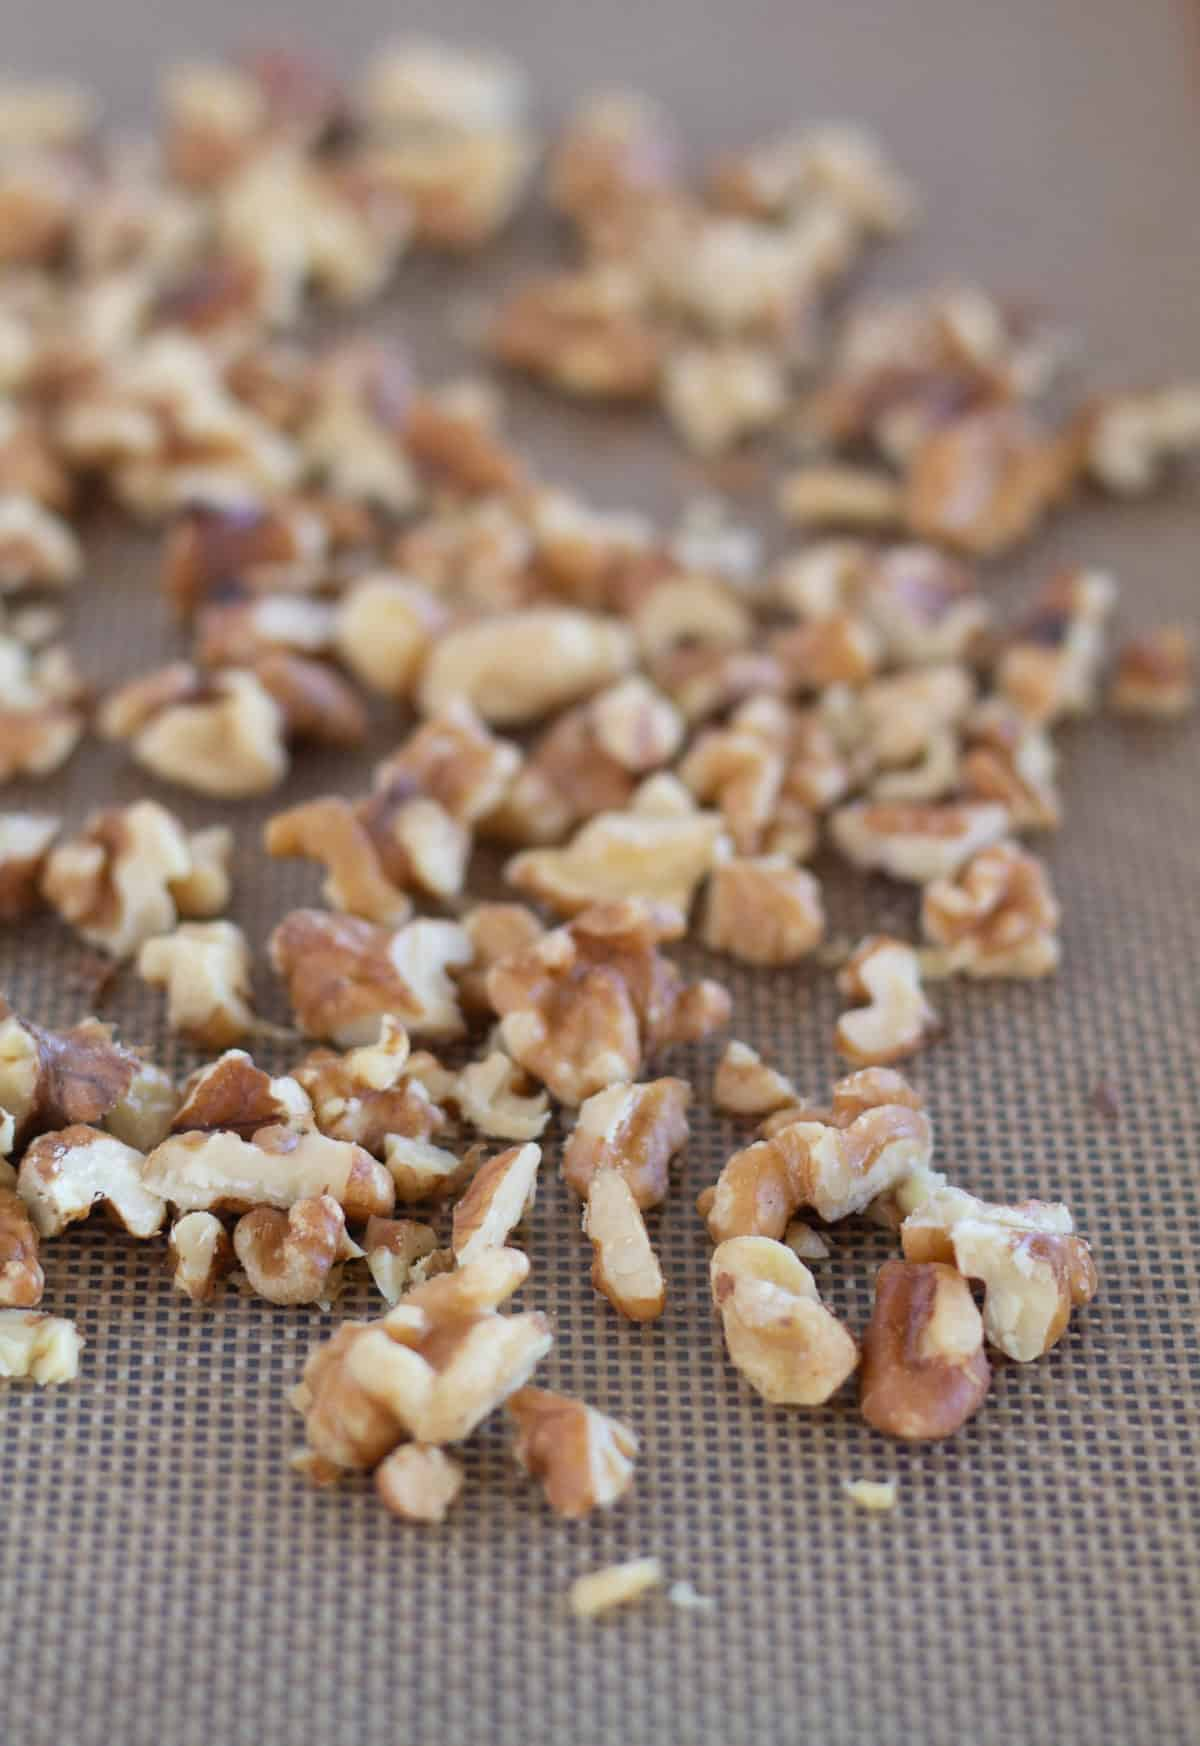 walnuts on a lined baking sheet